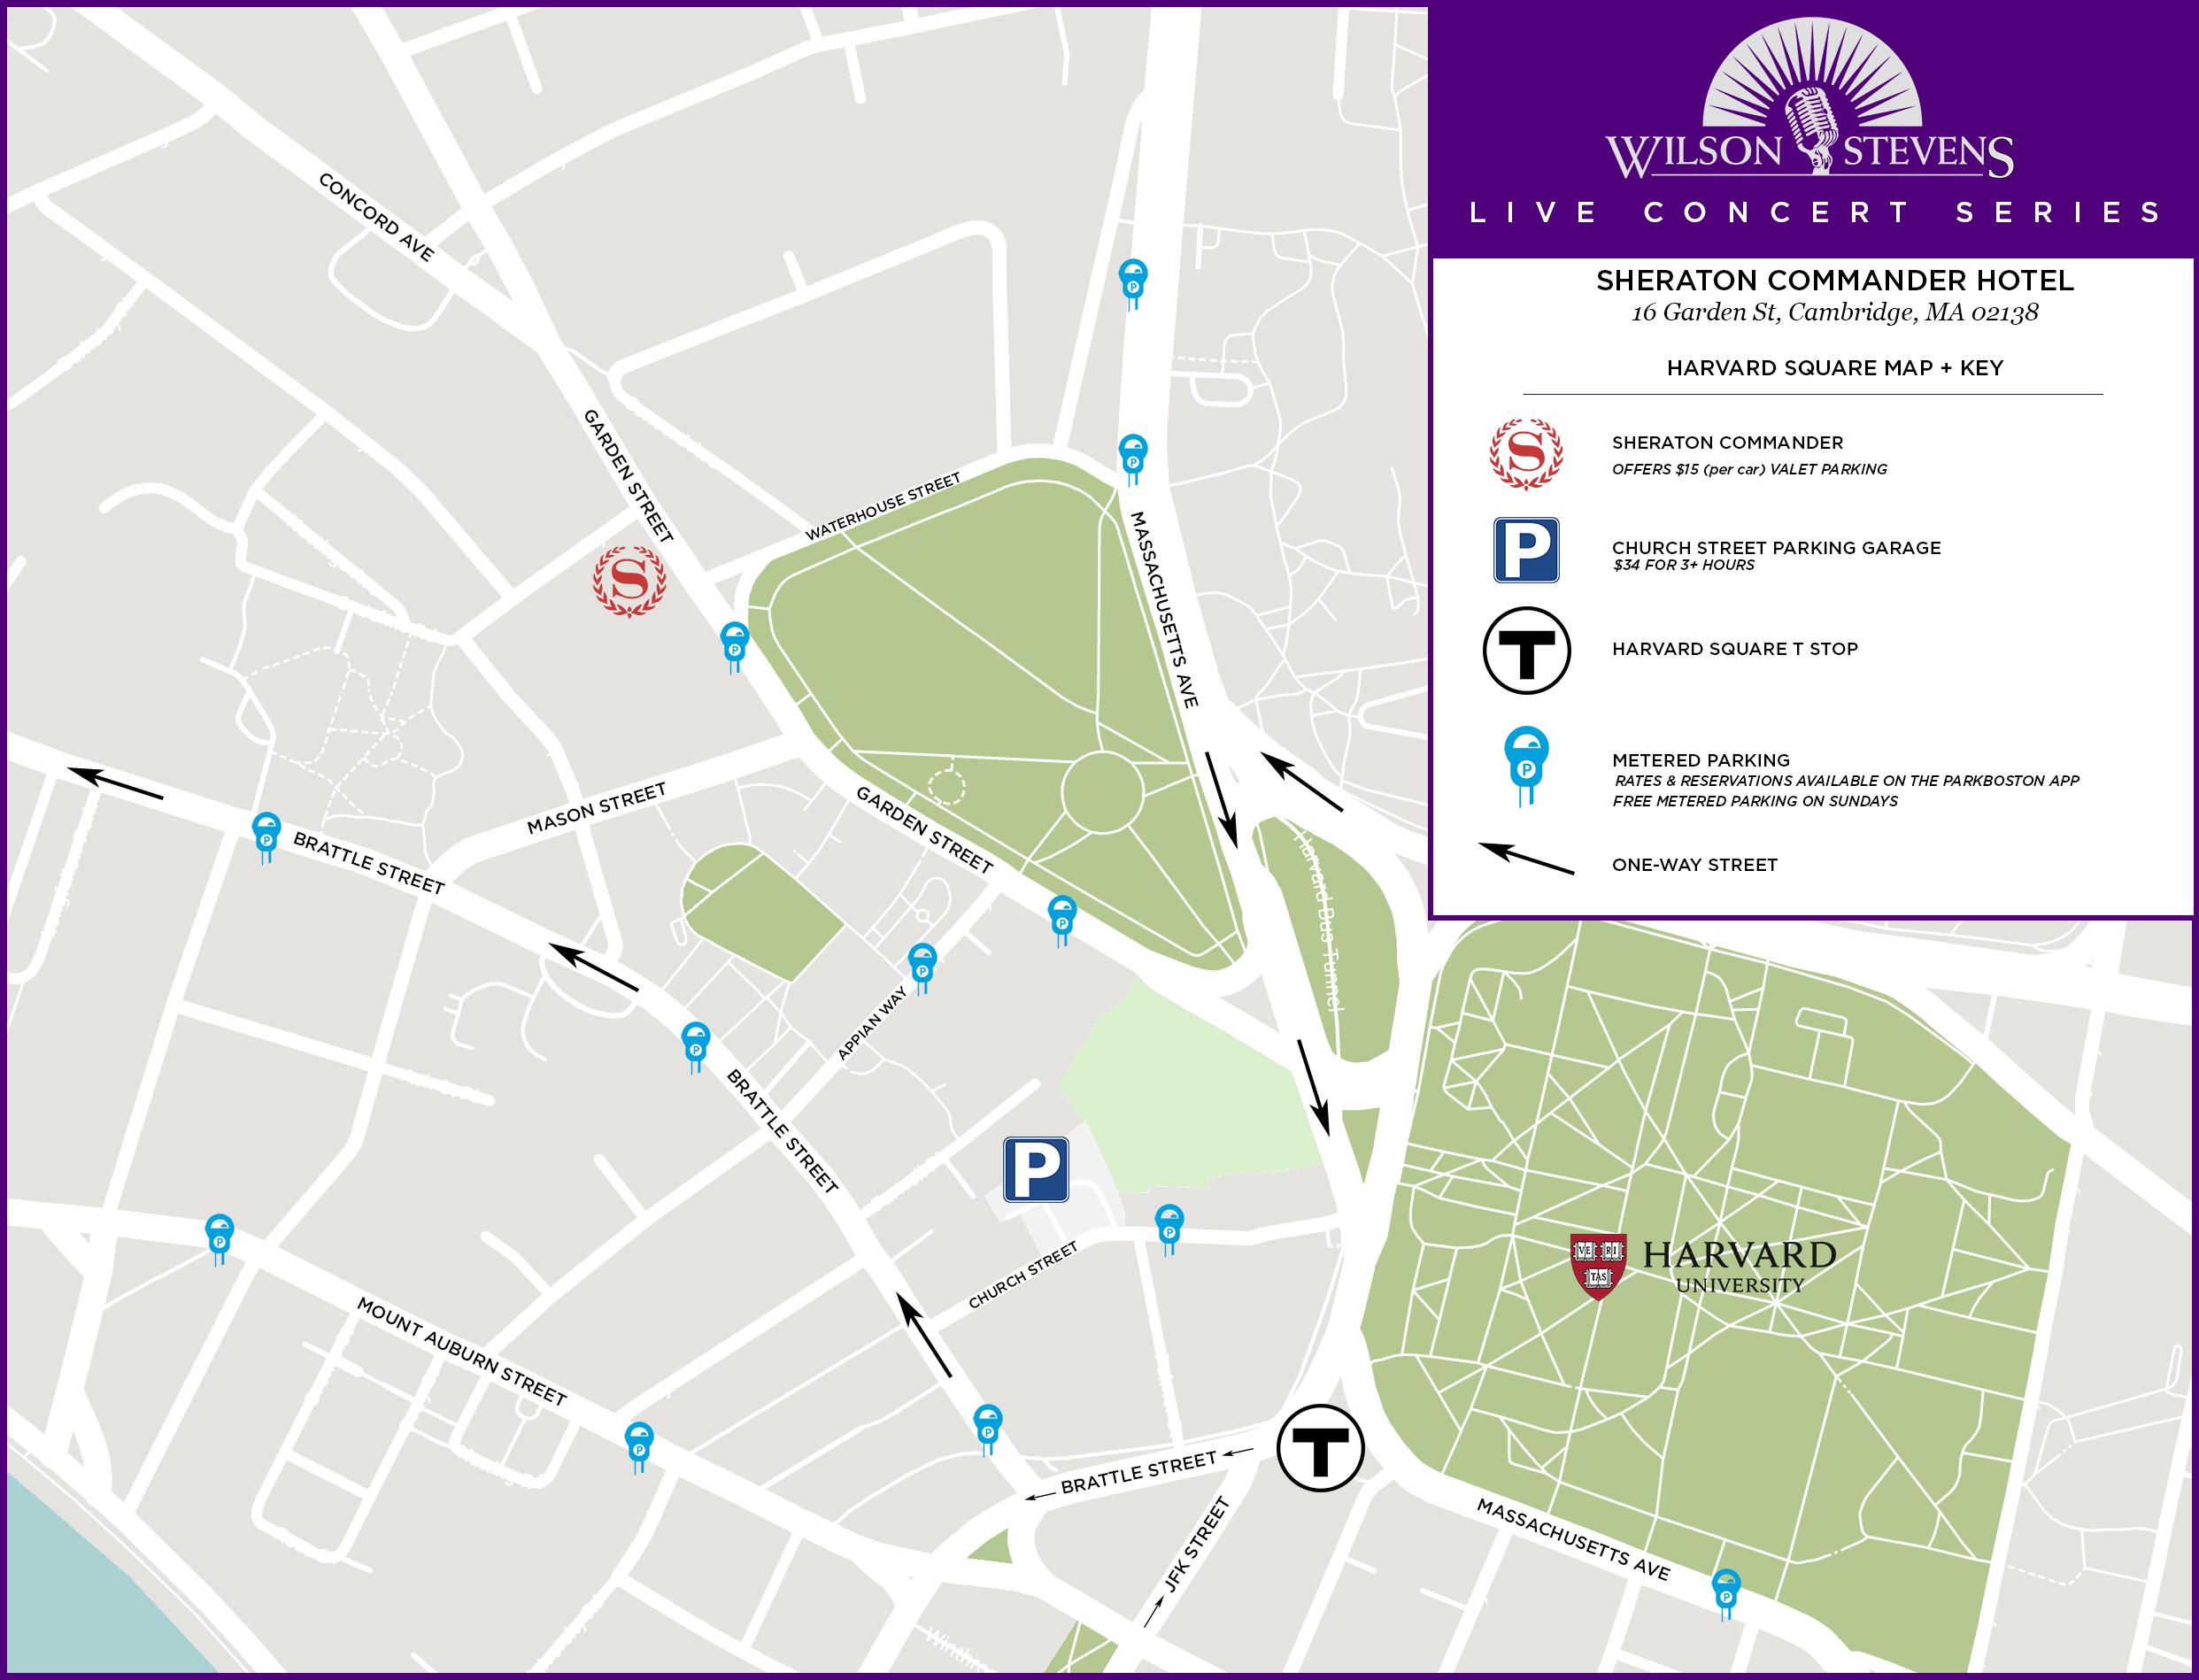 WS/Sheraton Commander Parking Map